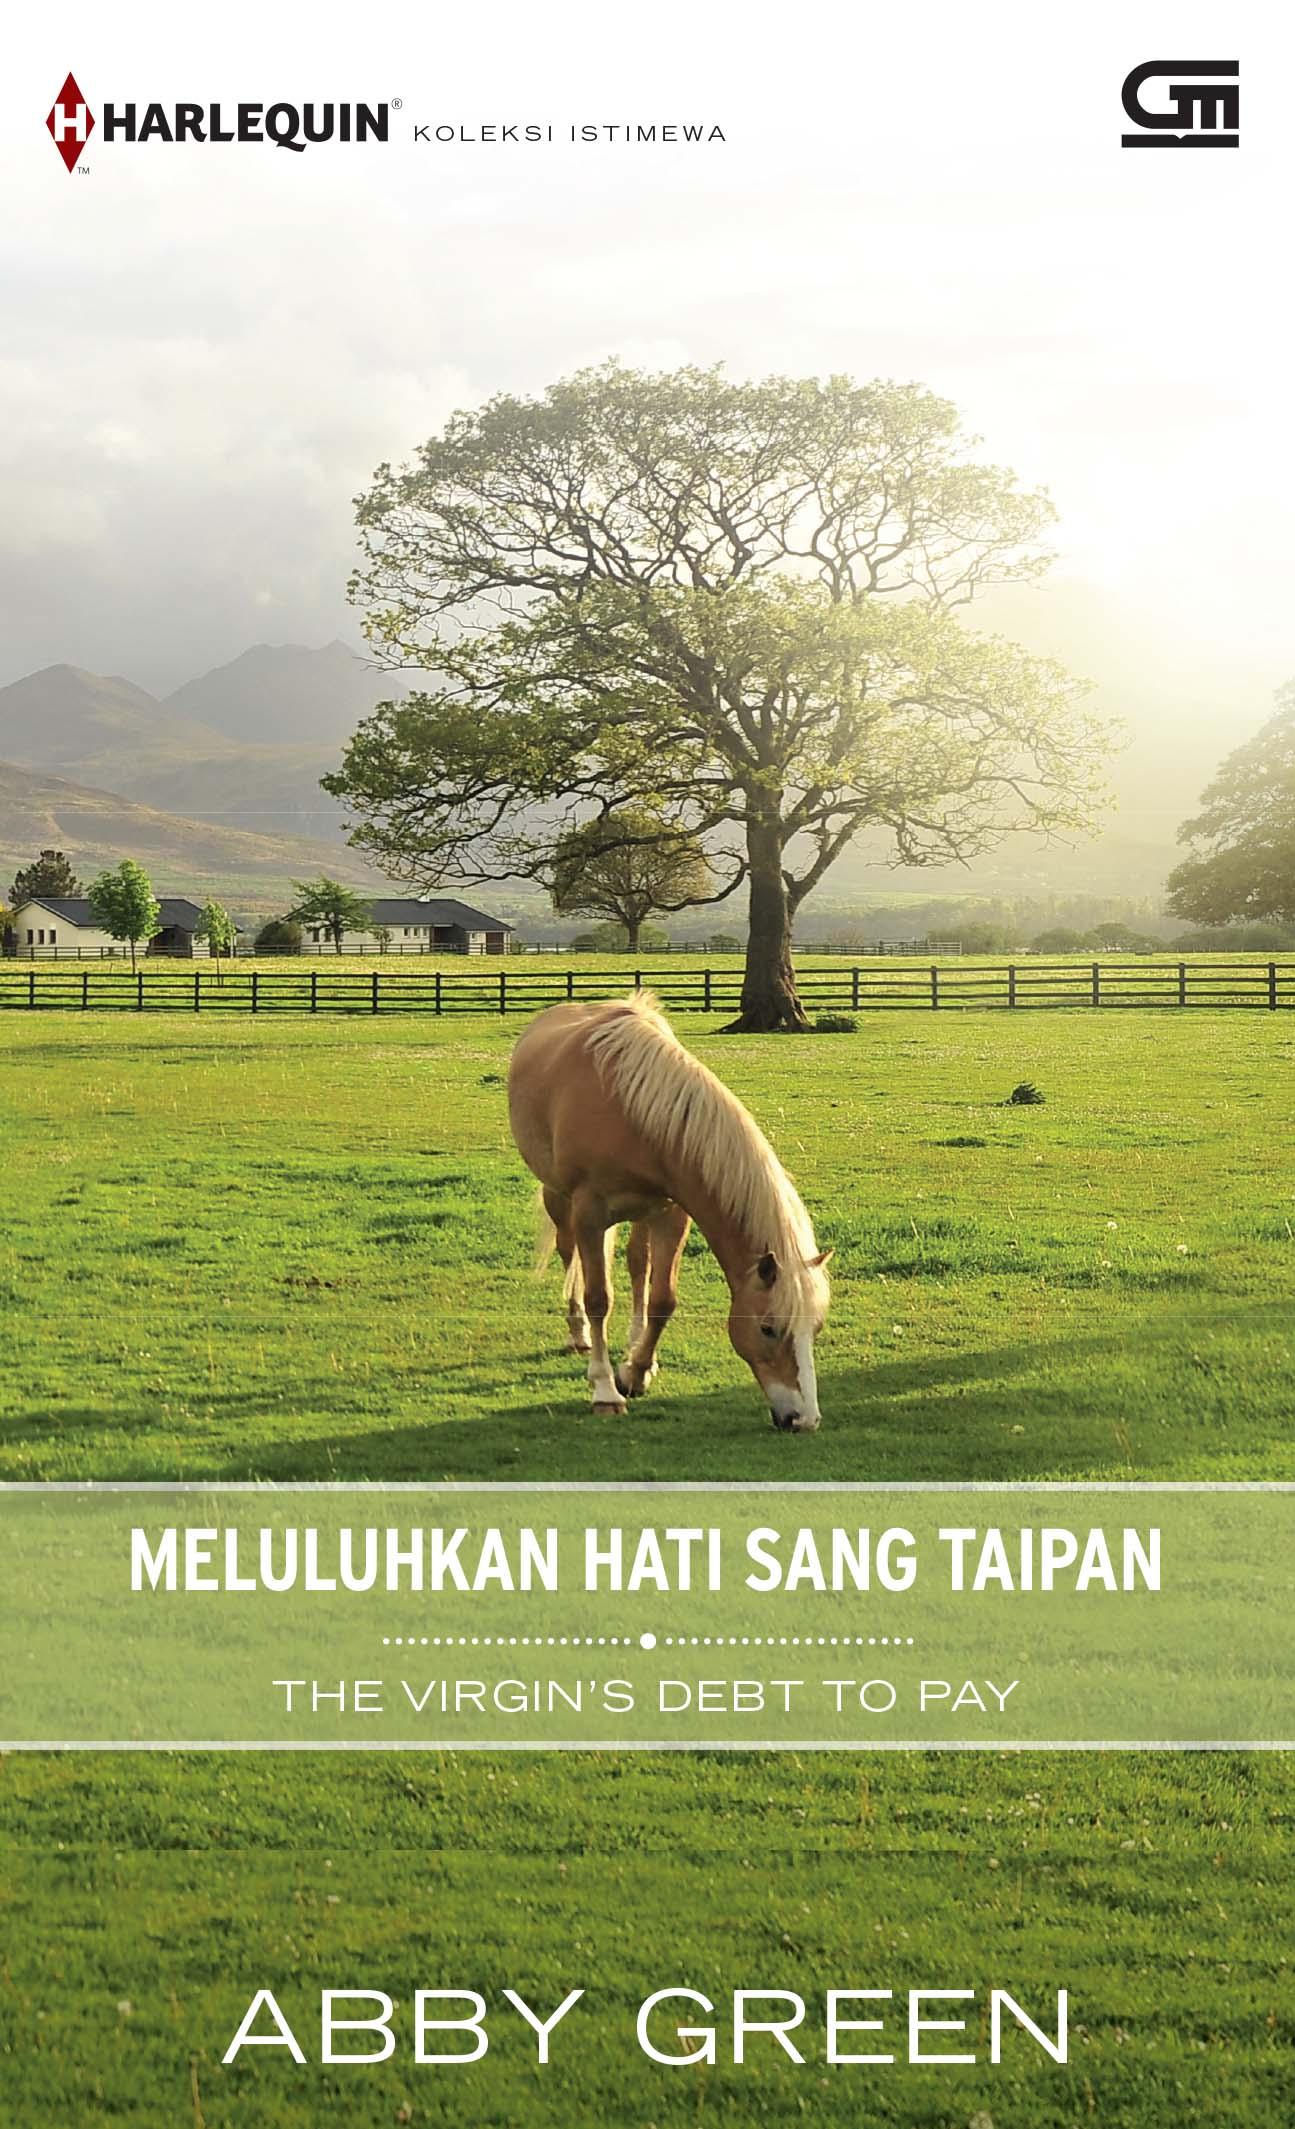 Harlequin Koleksi Istimewa: Meluluhkan Hati Sang Taipan (The Virgin\'s Debt to Pay)